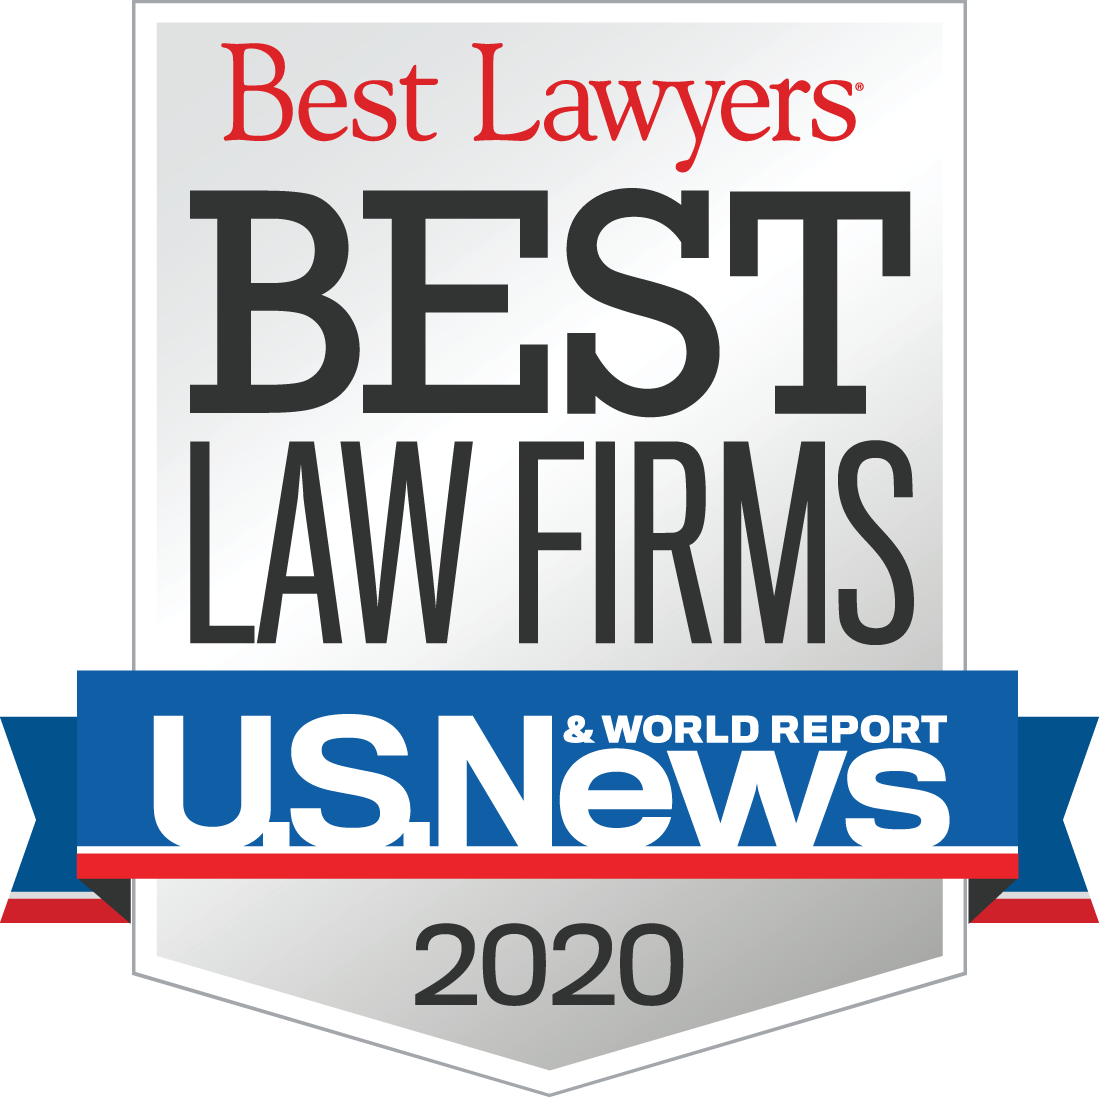 Best Law-firms-2020 Hite-Fanning-honeyman